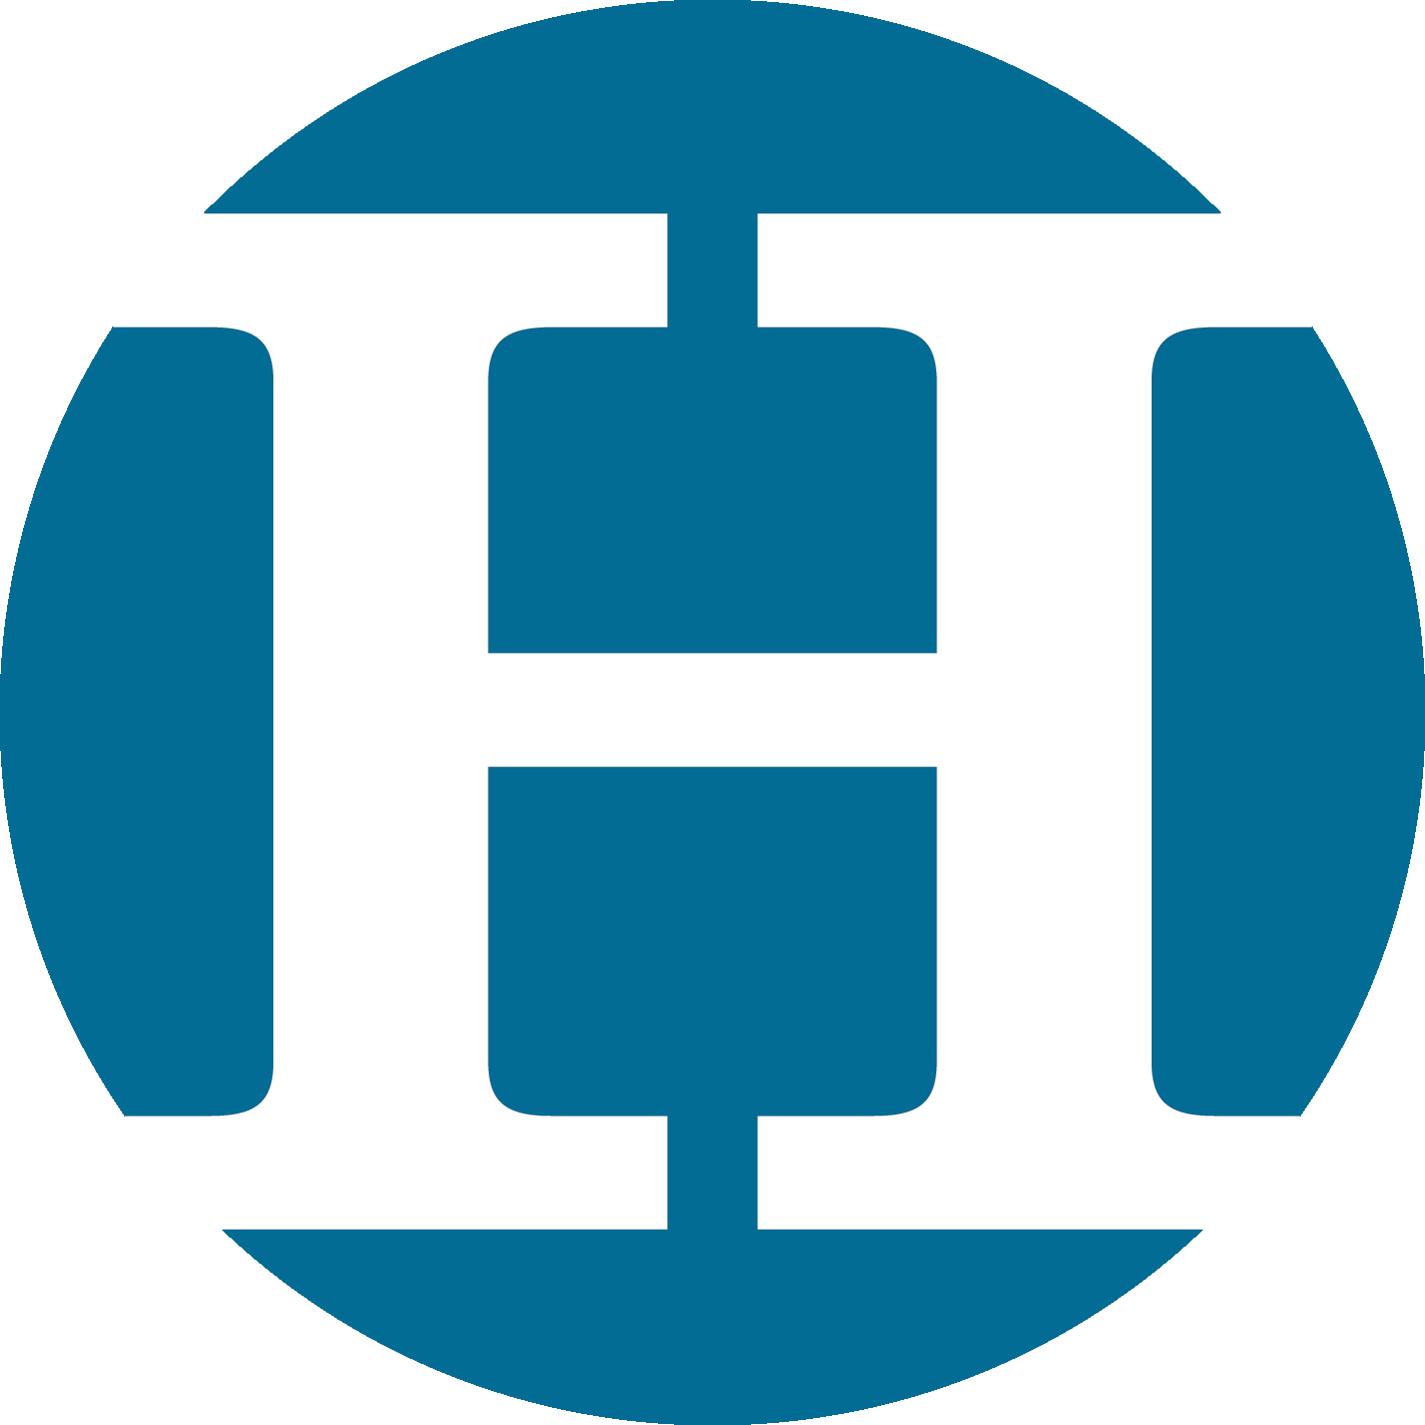 Haslam scholars university housing. Volunteering clipart civic responsibility